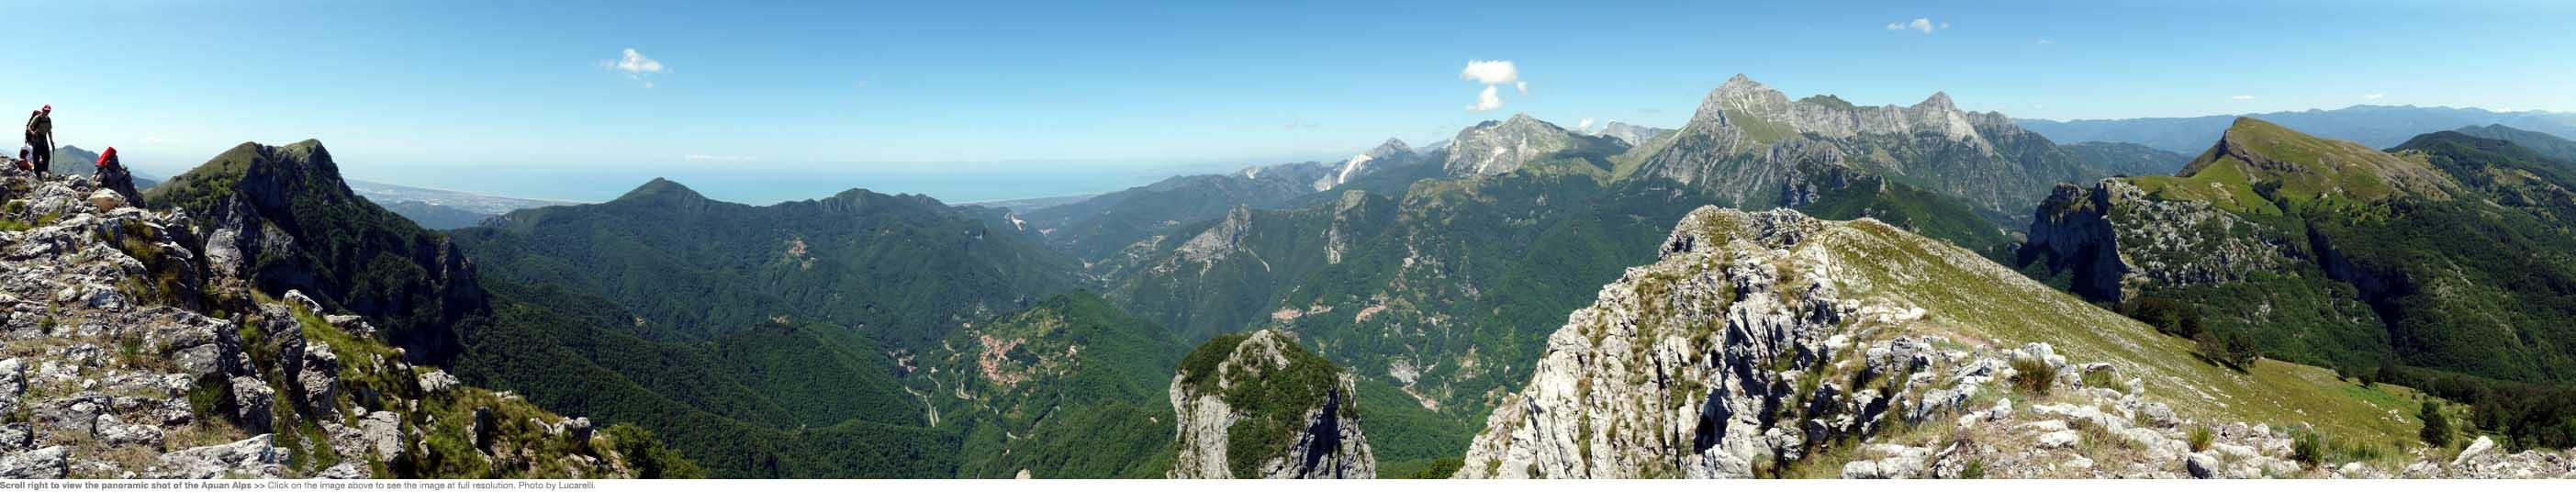 Alpi-Apuane-Panorama-Lucarelli